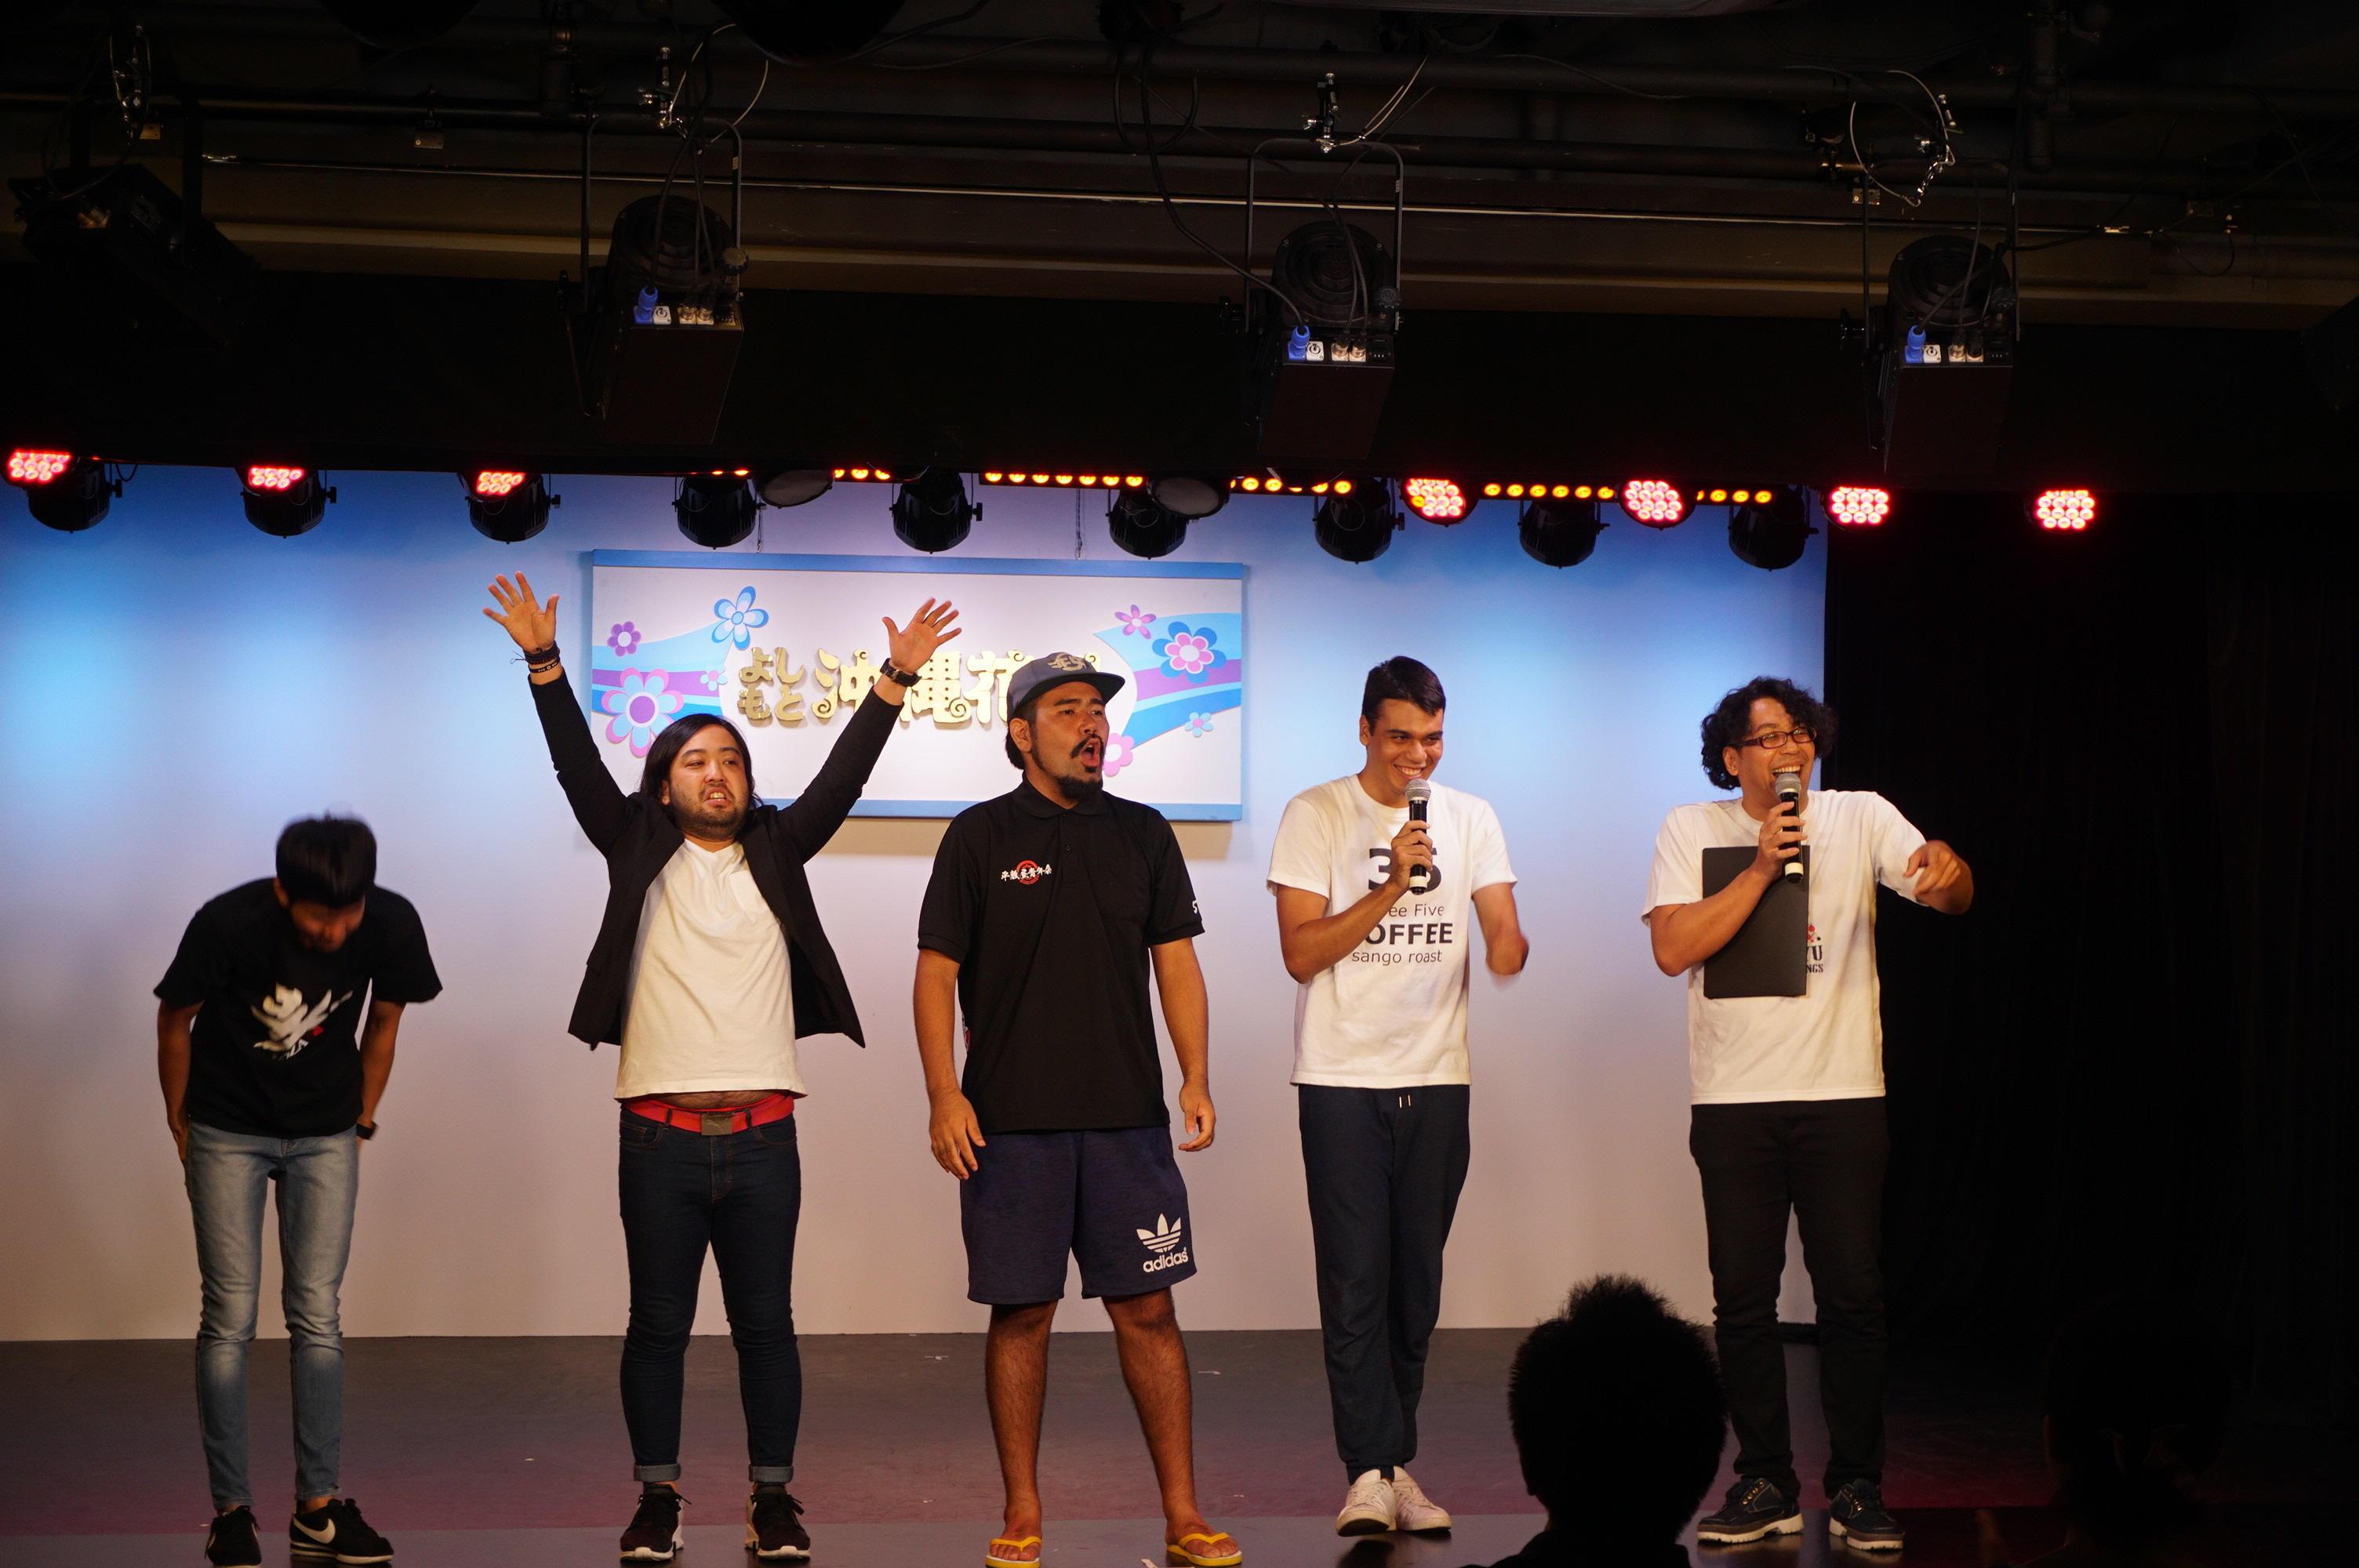 http://news.yoshimoto.co.jp/20170905173444-9418ecfdbbf06e0d6243c83f0520f2e73fec62b6.jpg